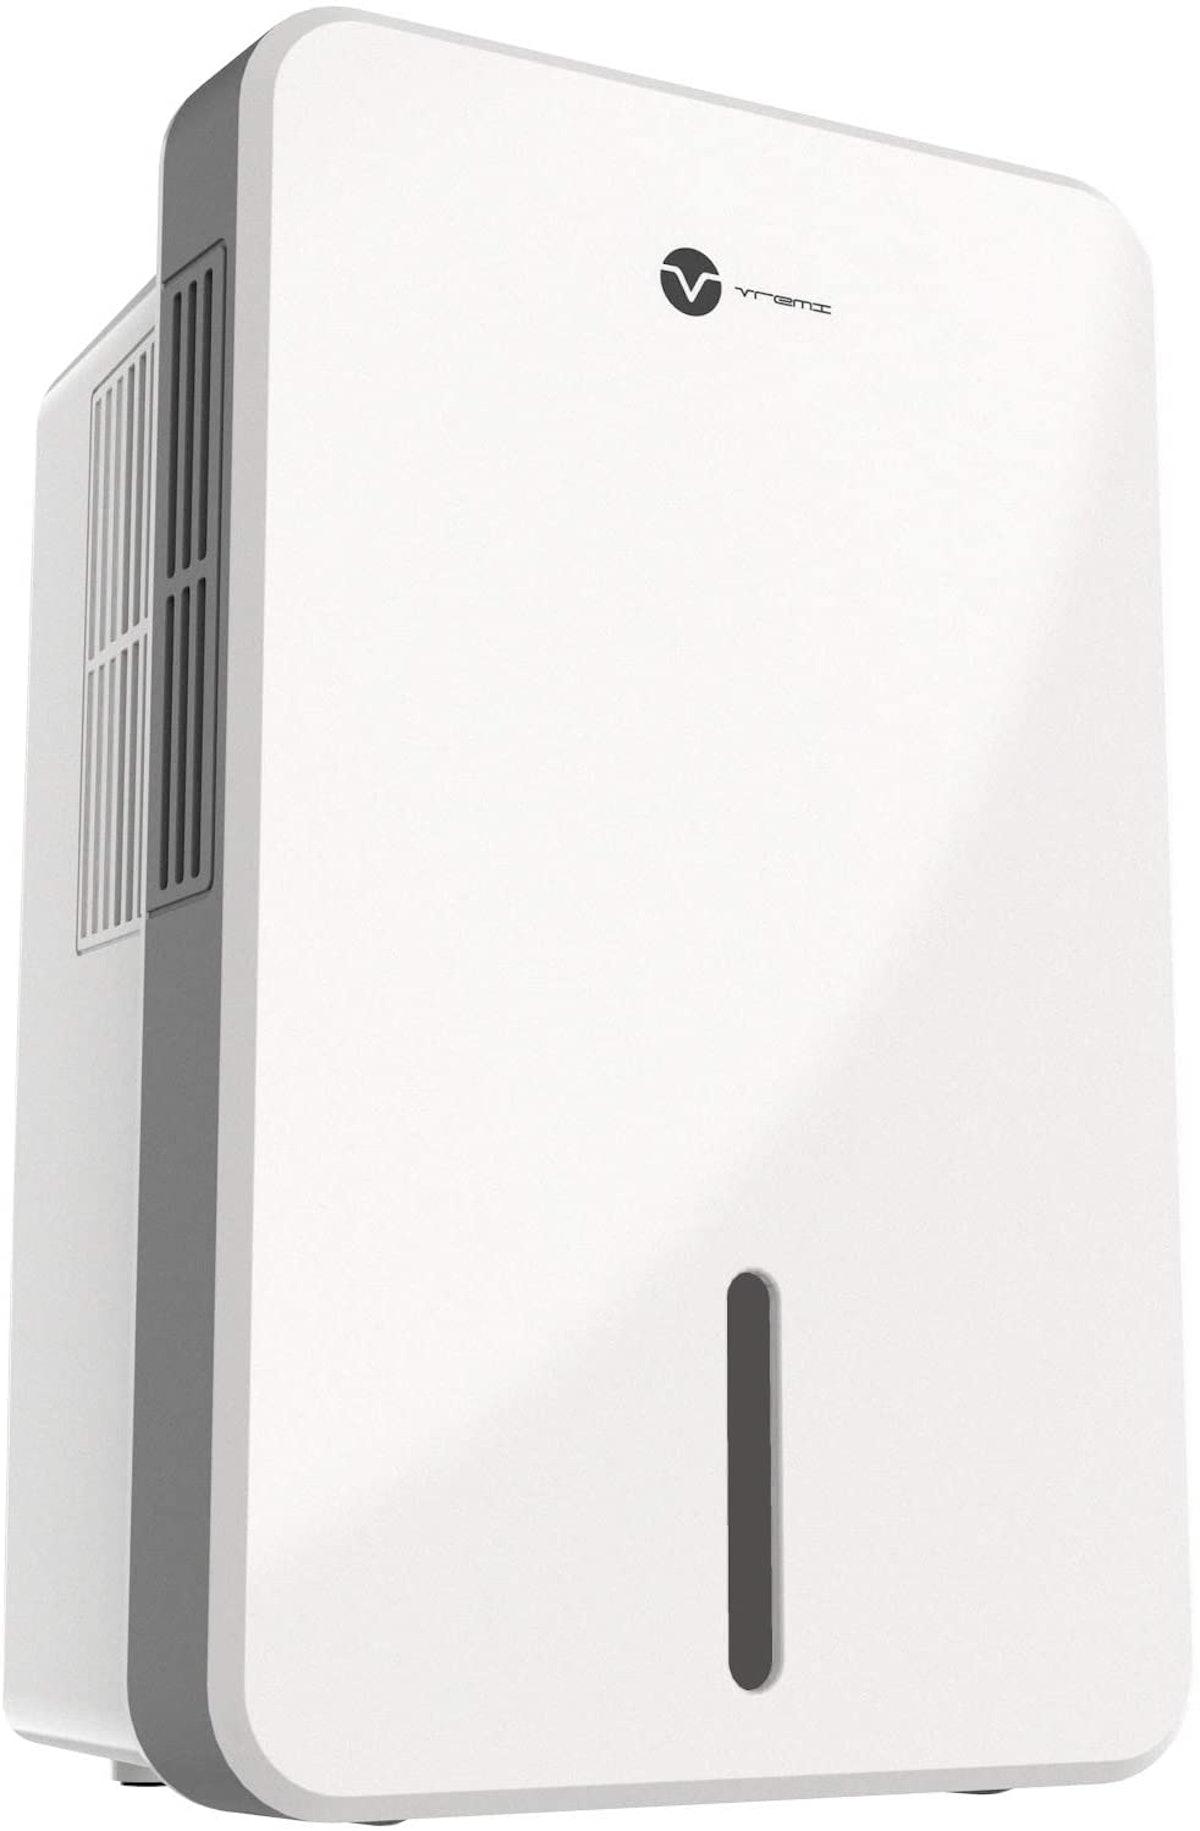 Vremi Compact Portable Dehumidifier